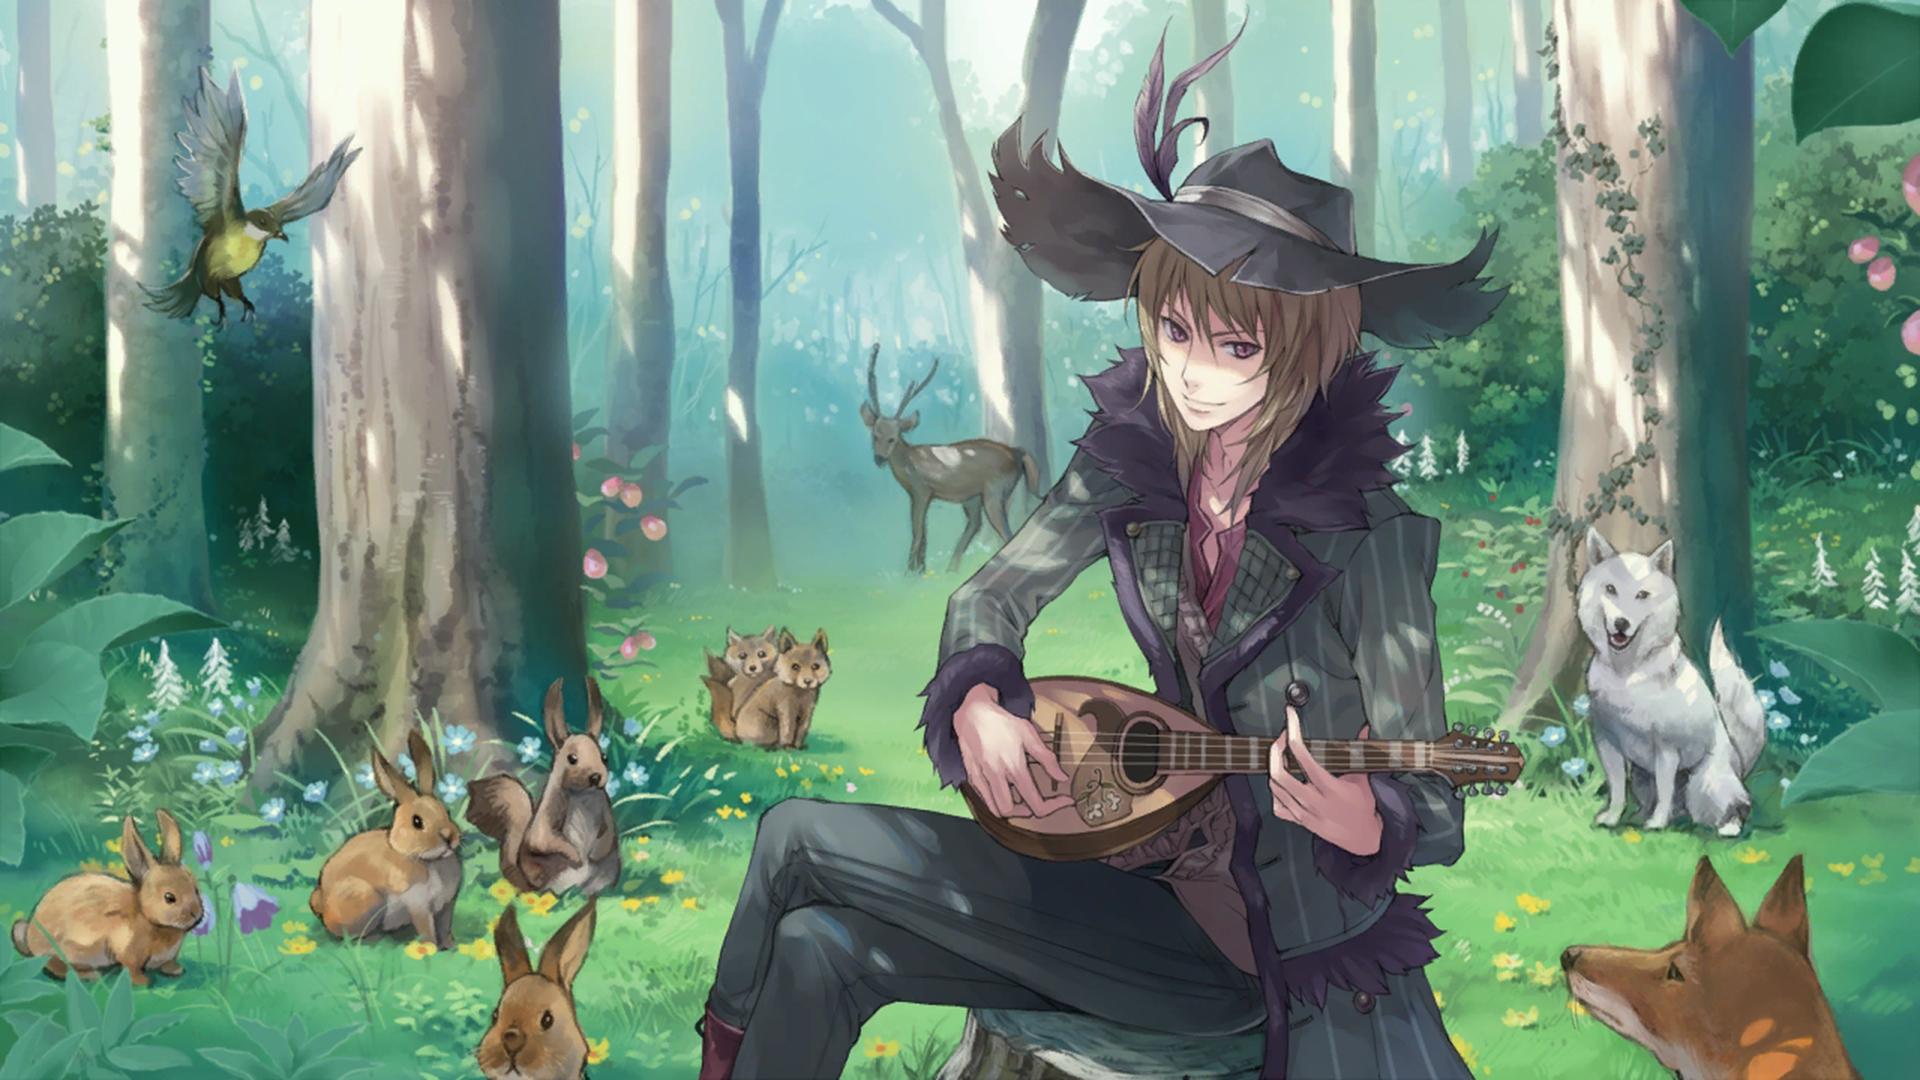 Atelier Rorona The Alchemist of Arland Wallpaper 013